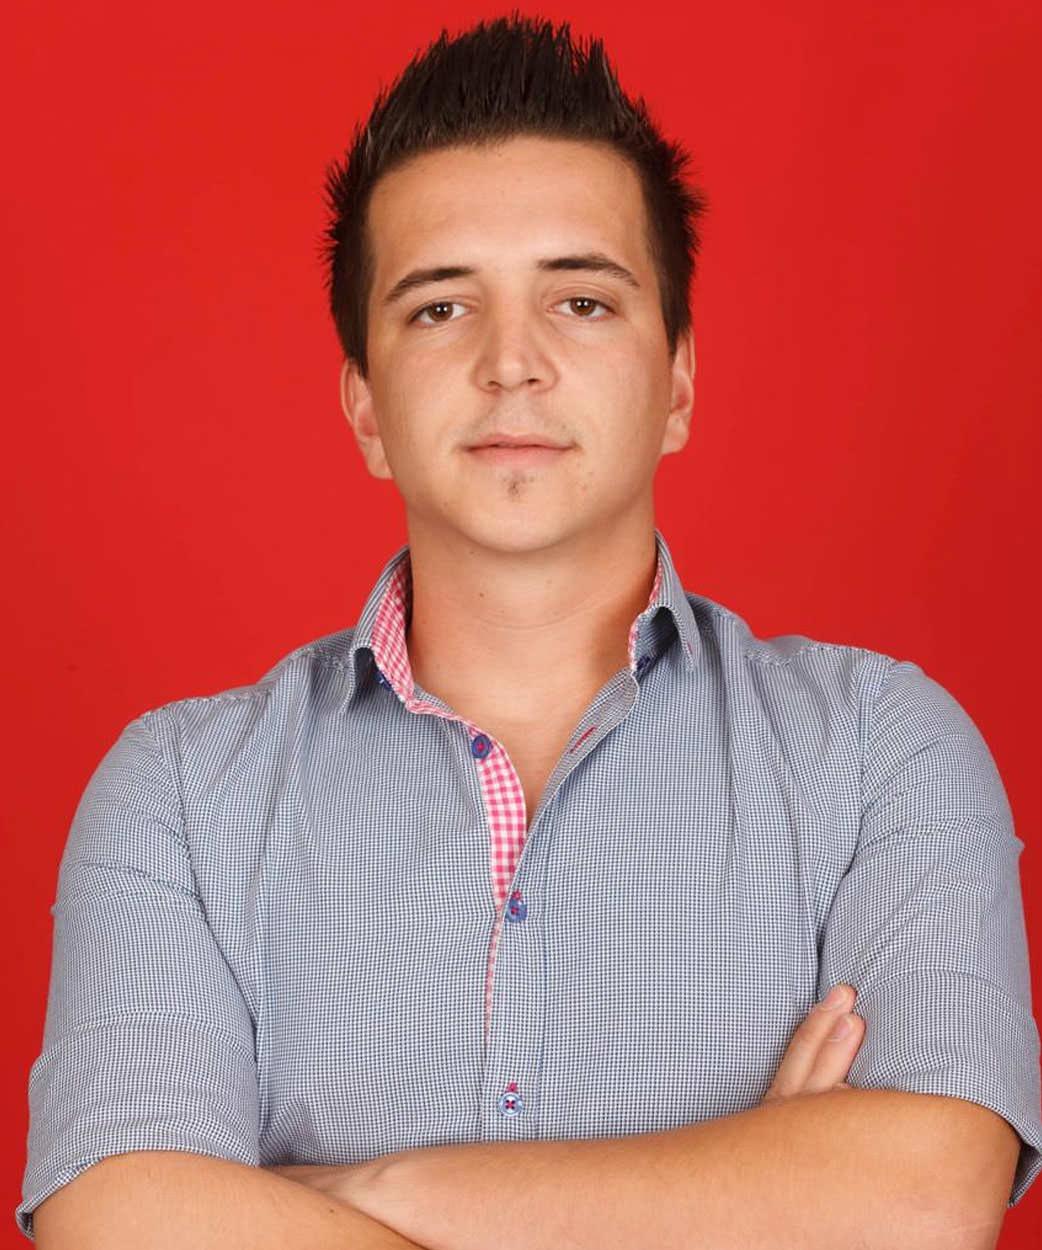 Sabir Redzepi